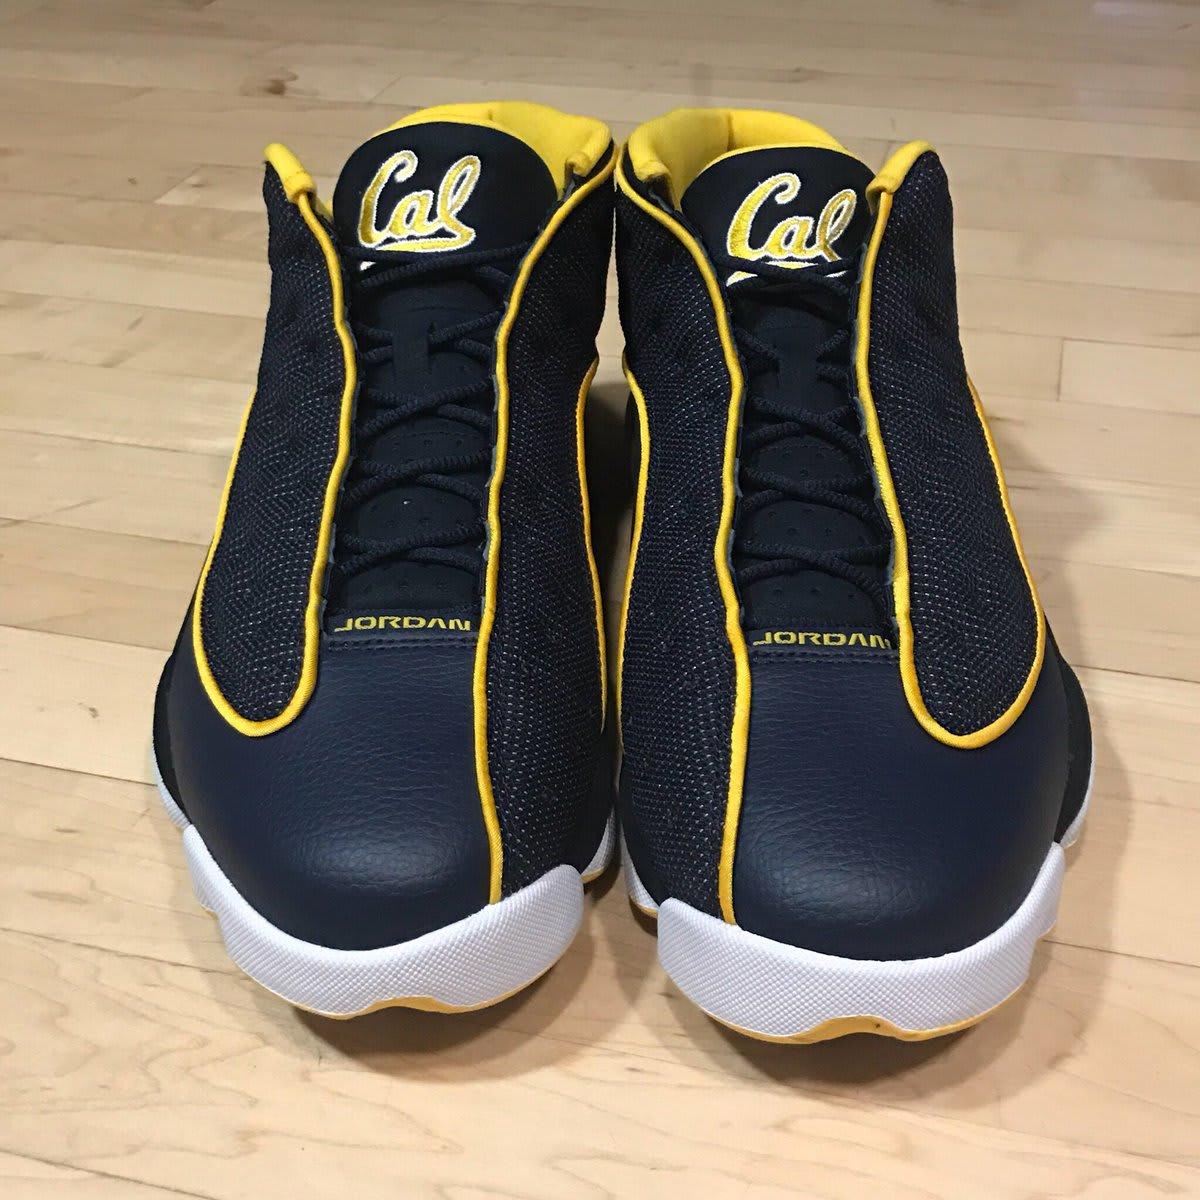 3d0e1a51bf01 Air Jordan 13 Low PE